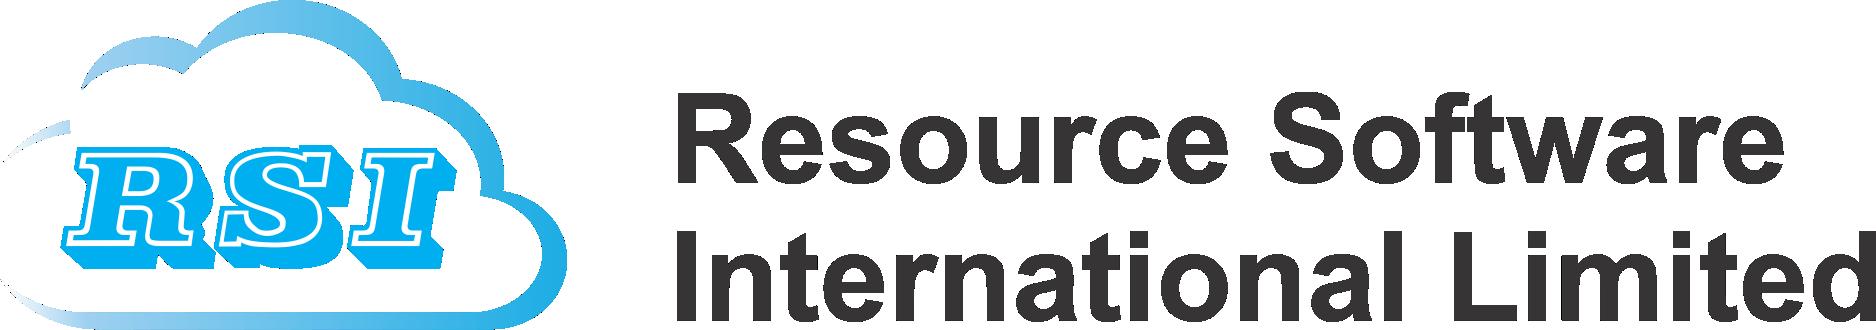 rsil logo